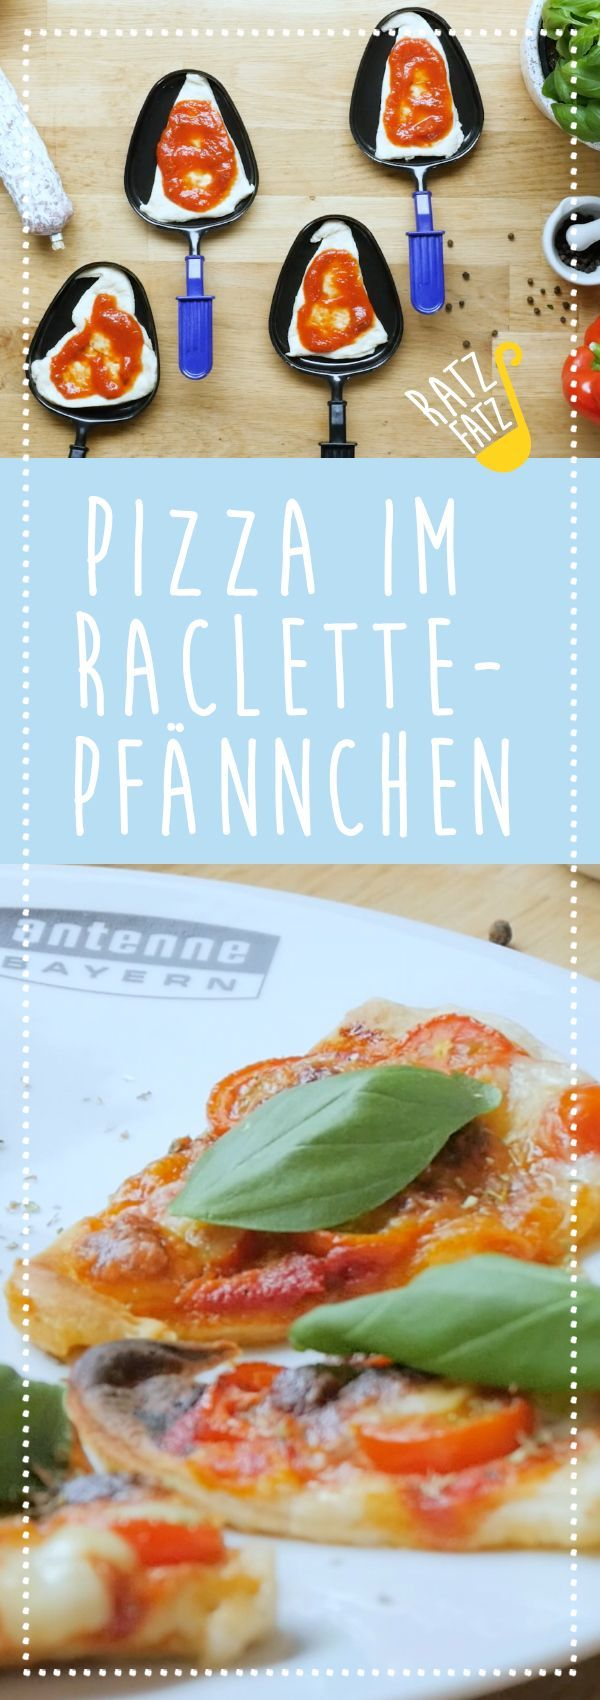 Pizza in raclette pans  Pizza in raclette pans